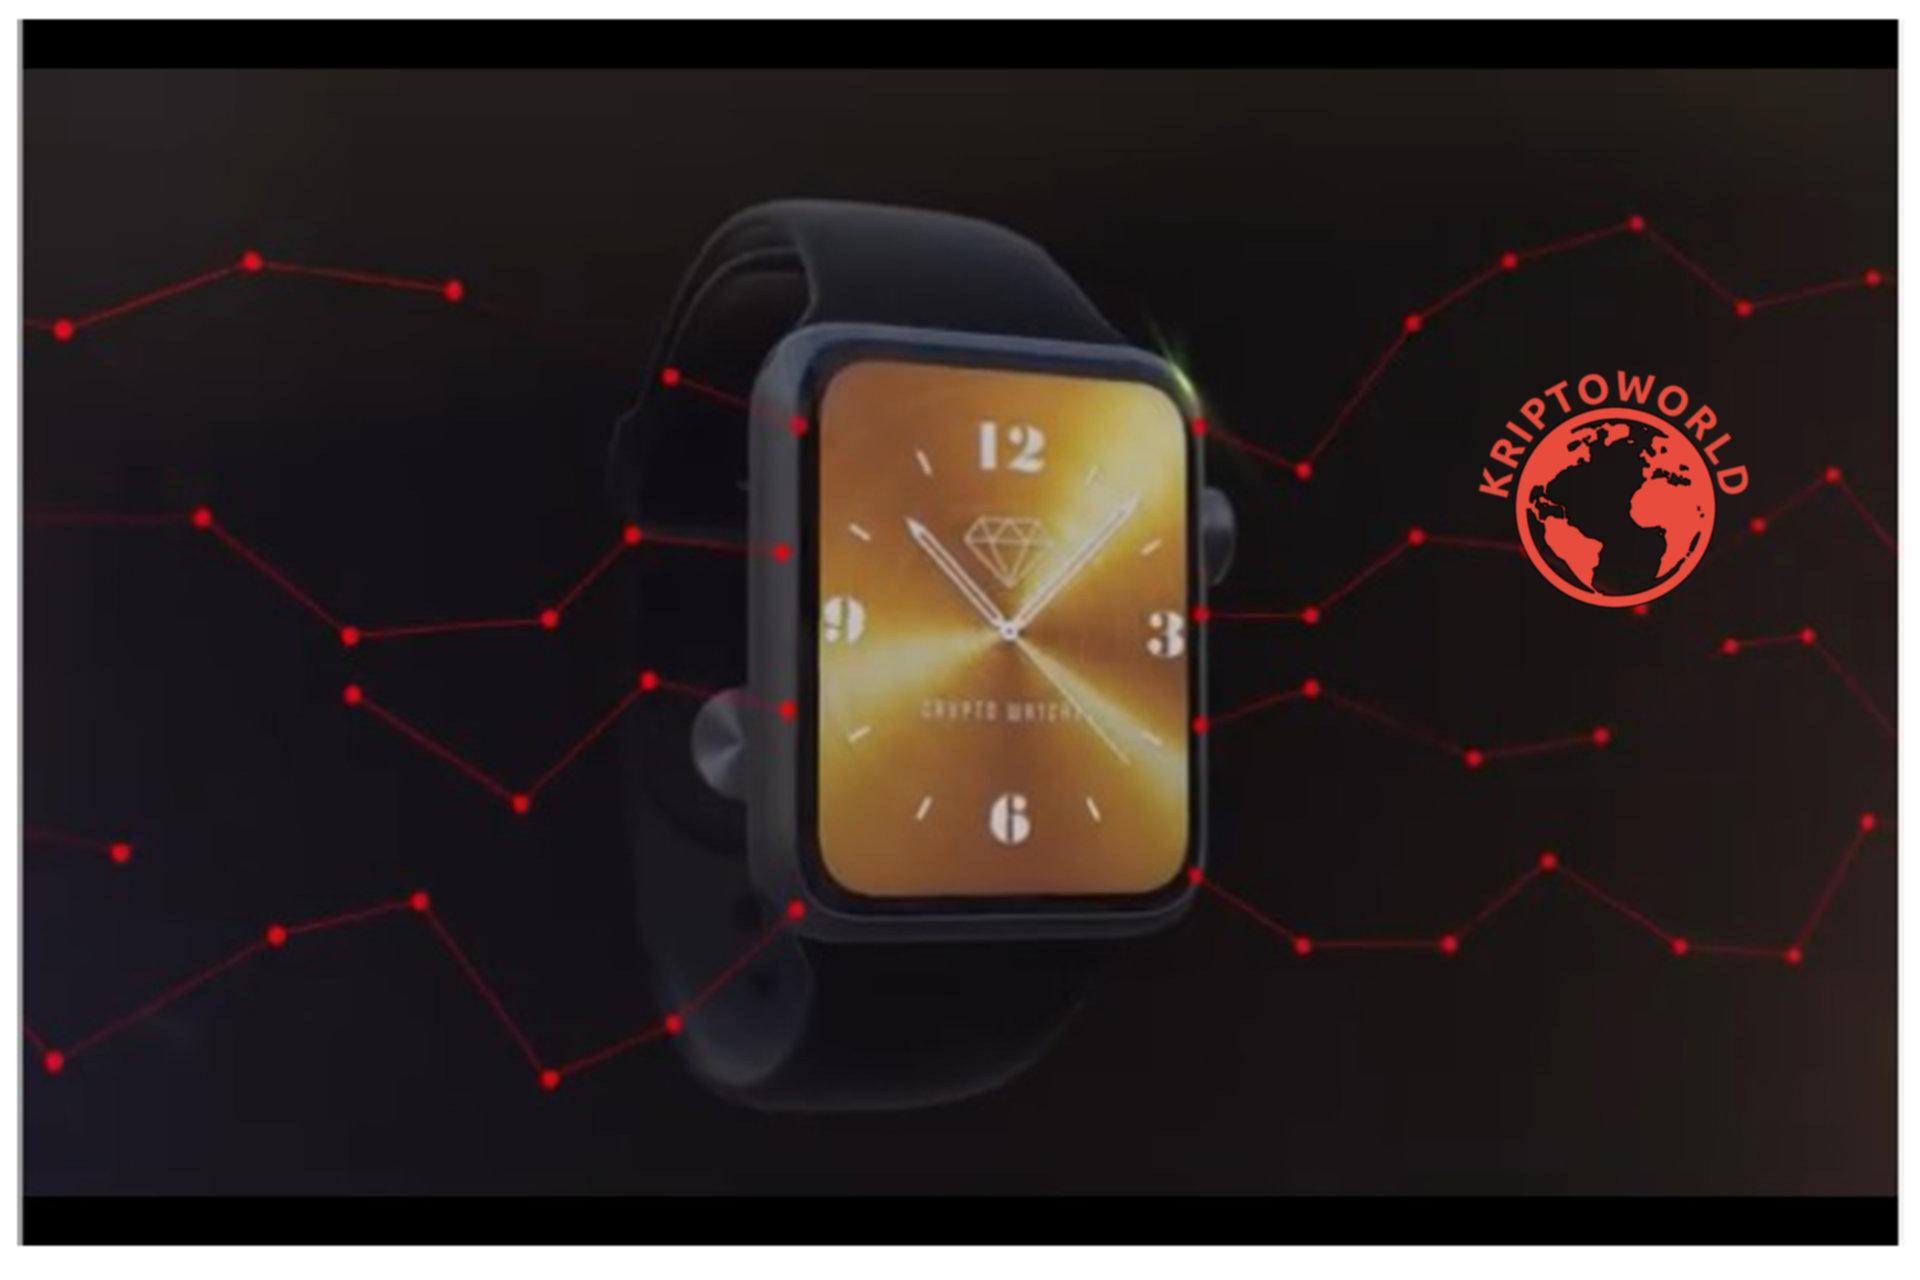 Egyedi okosóra skin a WatchSkins tokenizált platformján